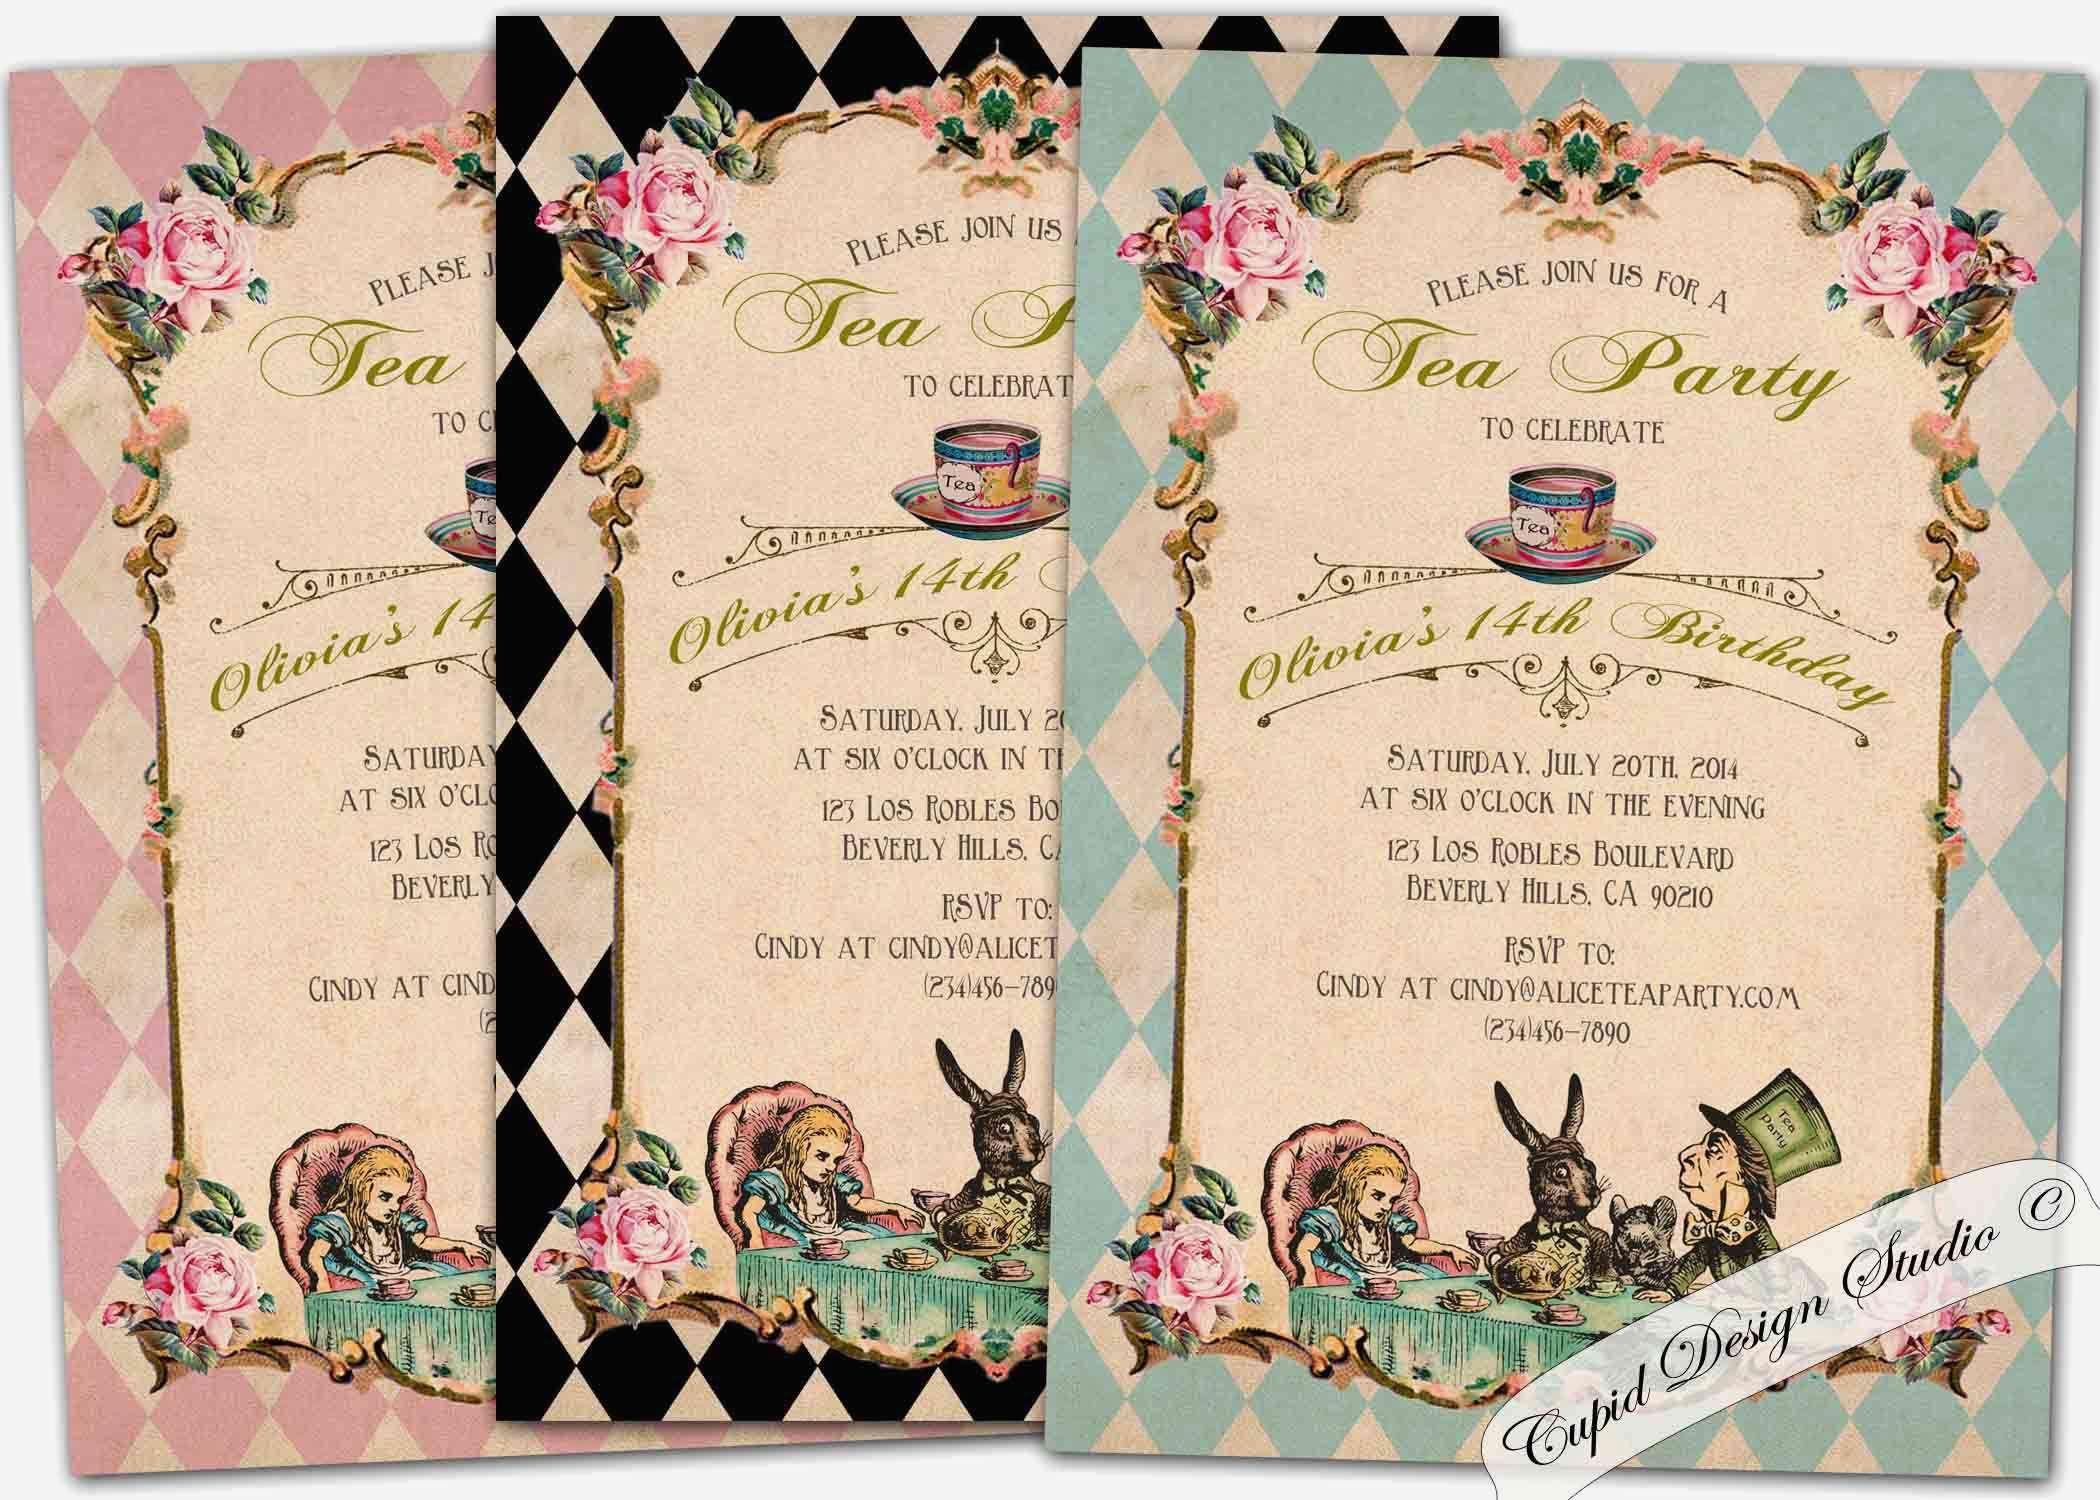 010 Unbelievable Alice In Wonderland Invite Template Design  Party Invitation FreeFull